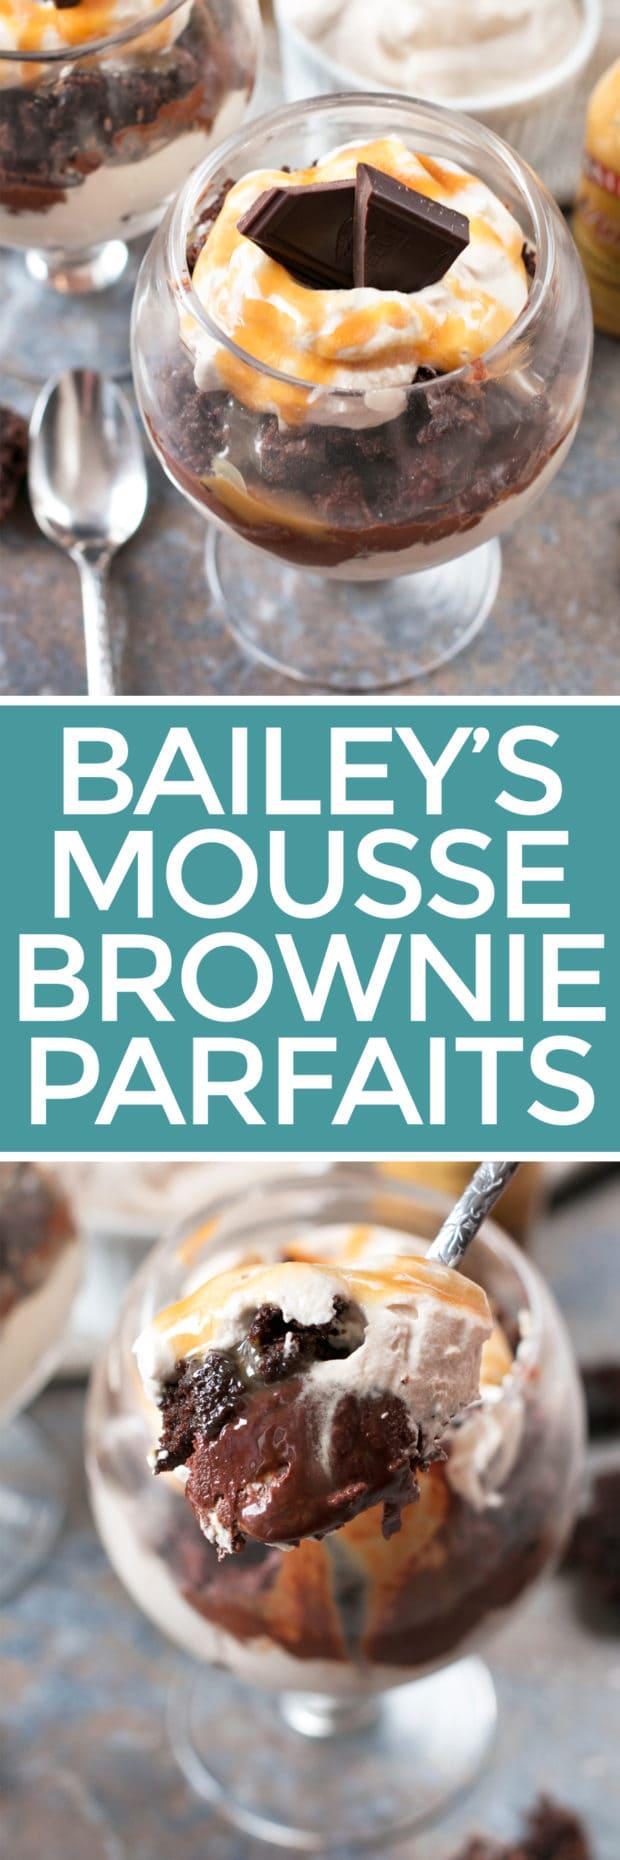 Bailey's Chocolate Mousse Brownie Parfaits | cakenknife.com #dessert #chocolate